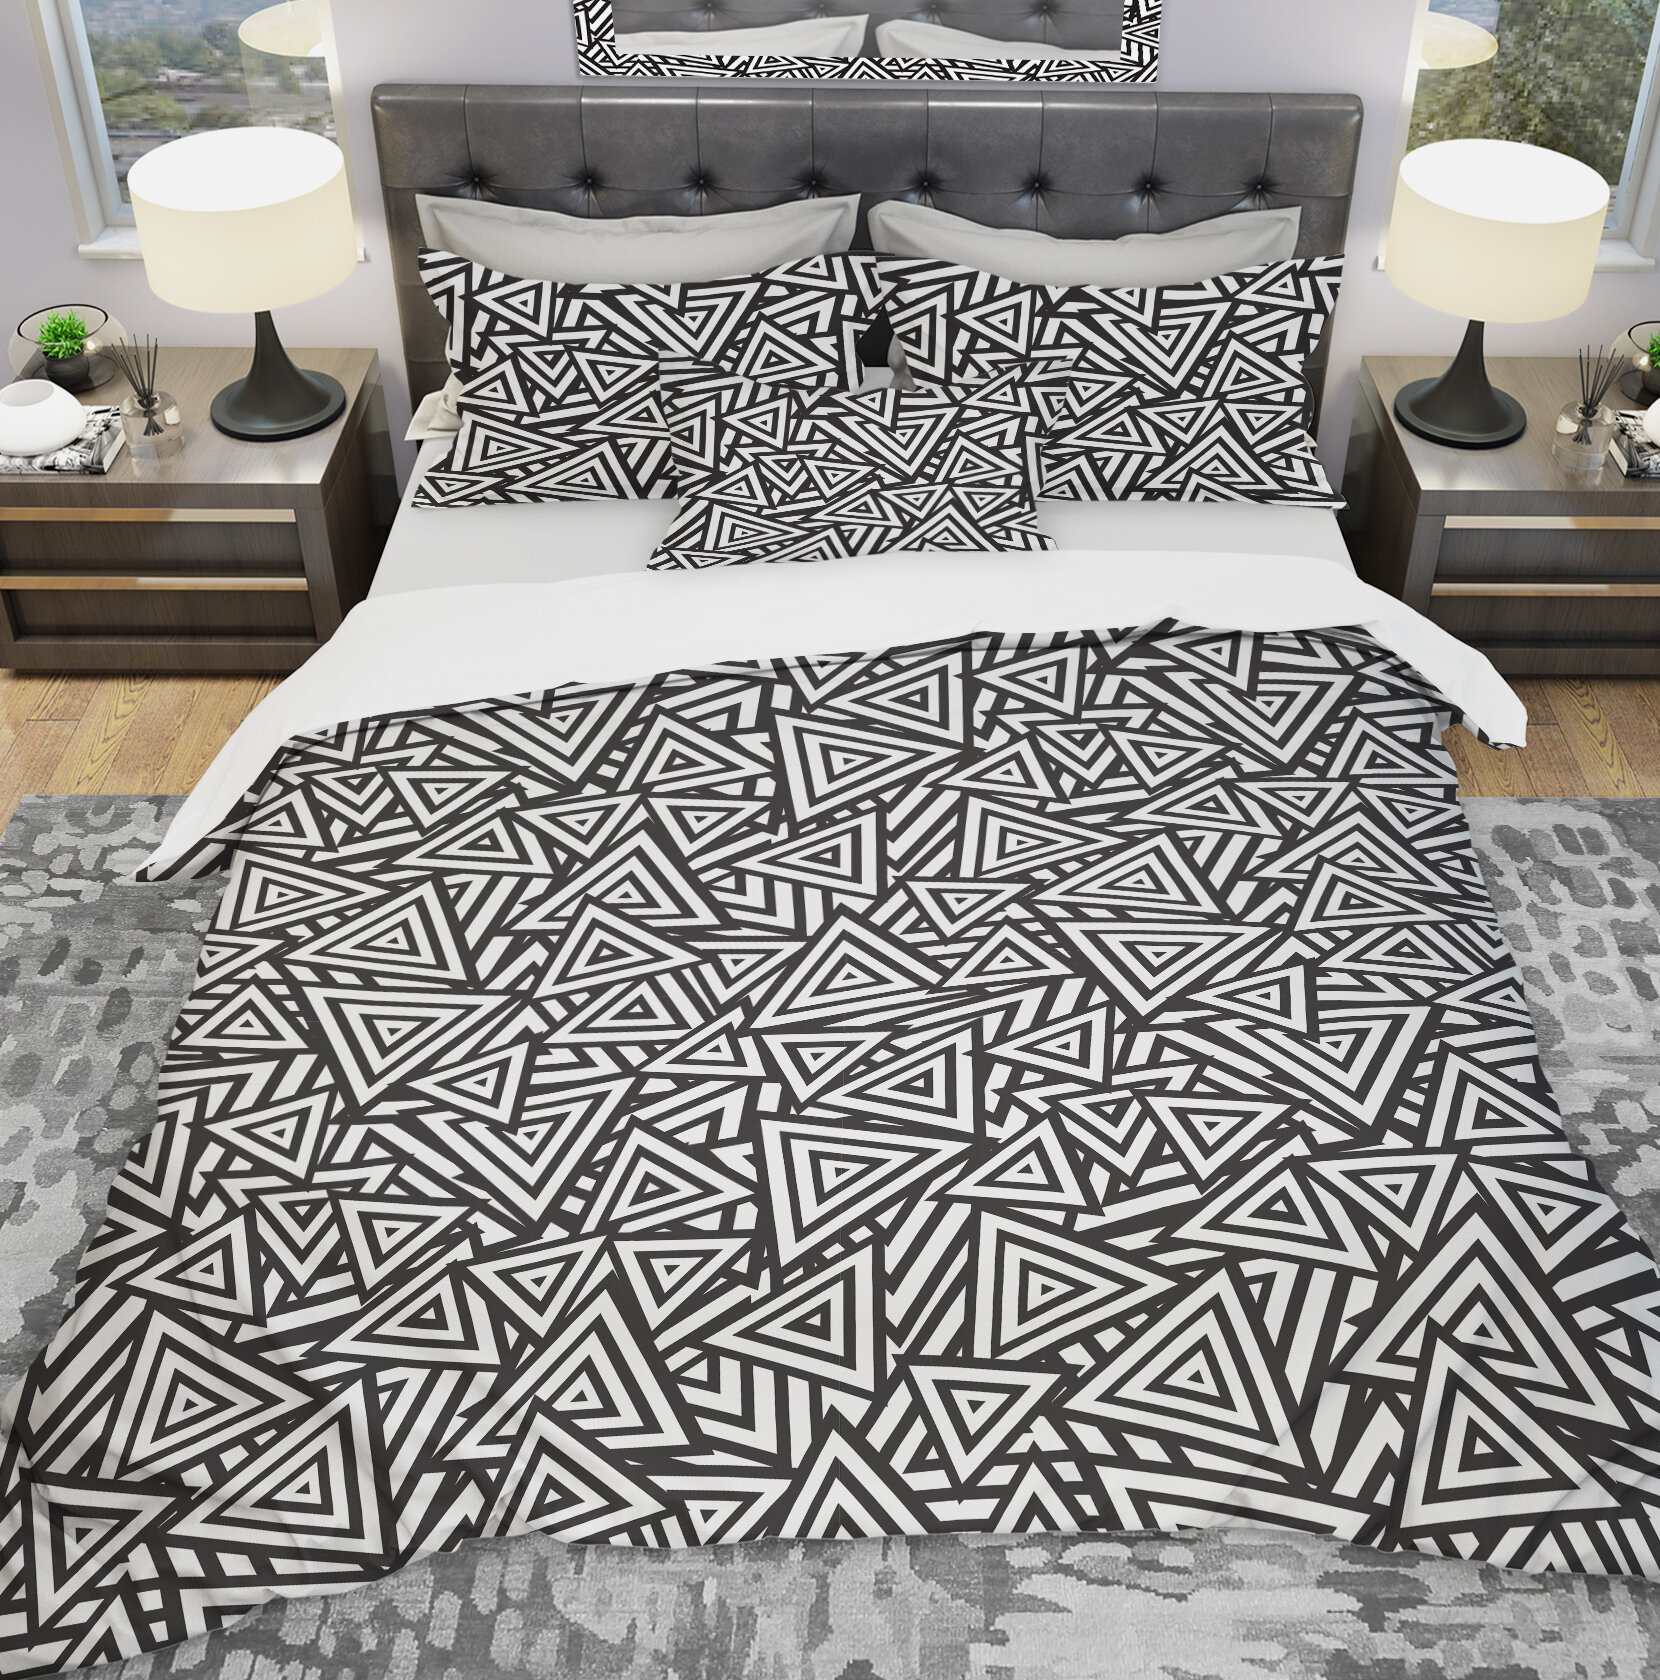 Beauty Decor Ethnic Style Duvet Cover Set Geometric Triangle